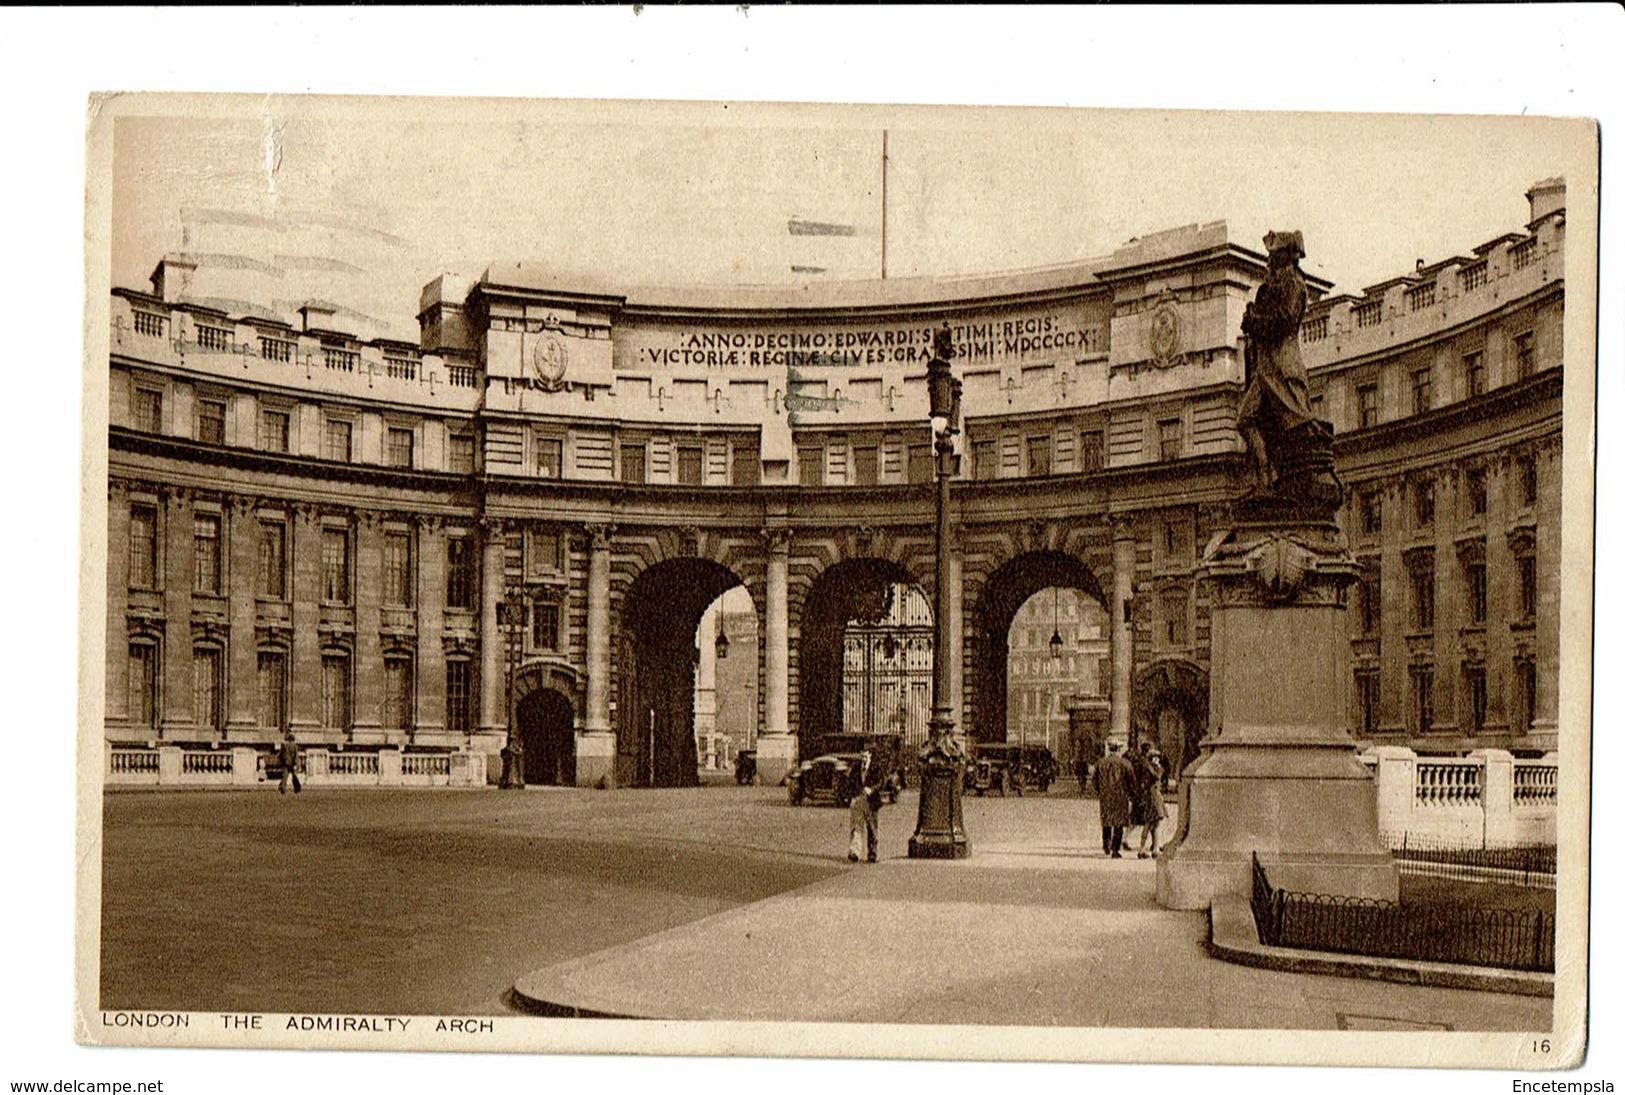 CPA - Carte Postale Royaume Uni-London -The Admiralty Arch 1933 -VM2383 - London